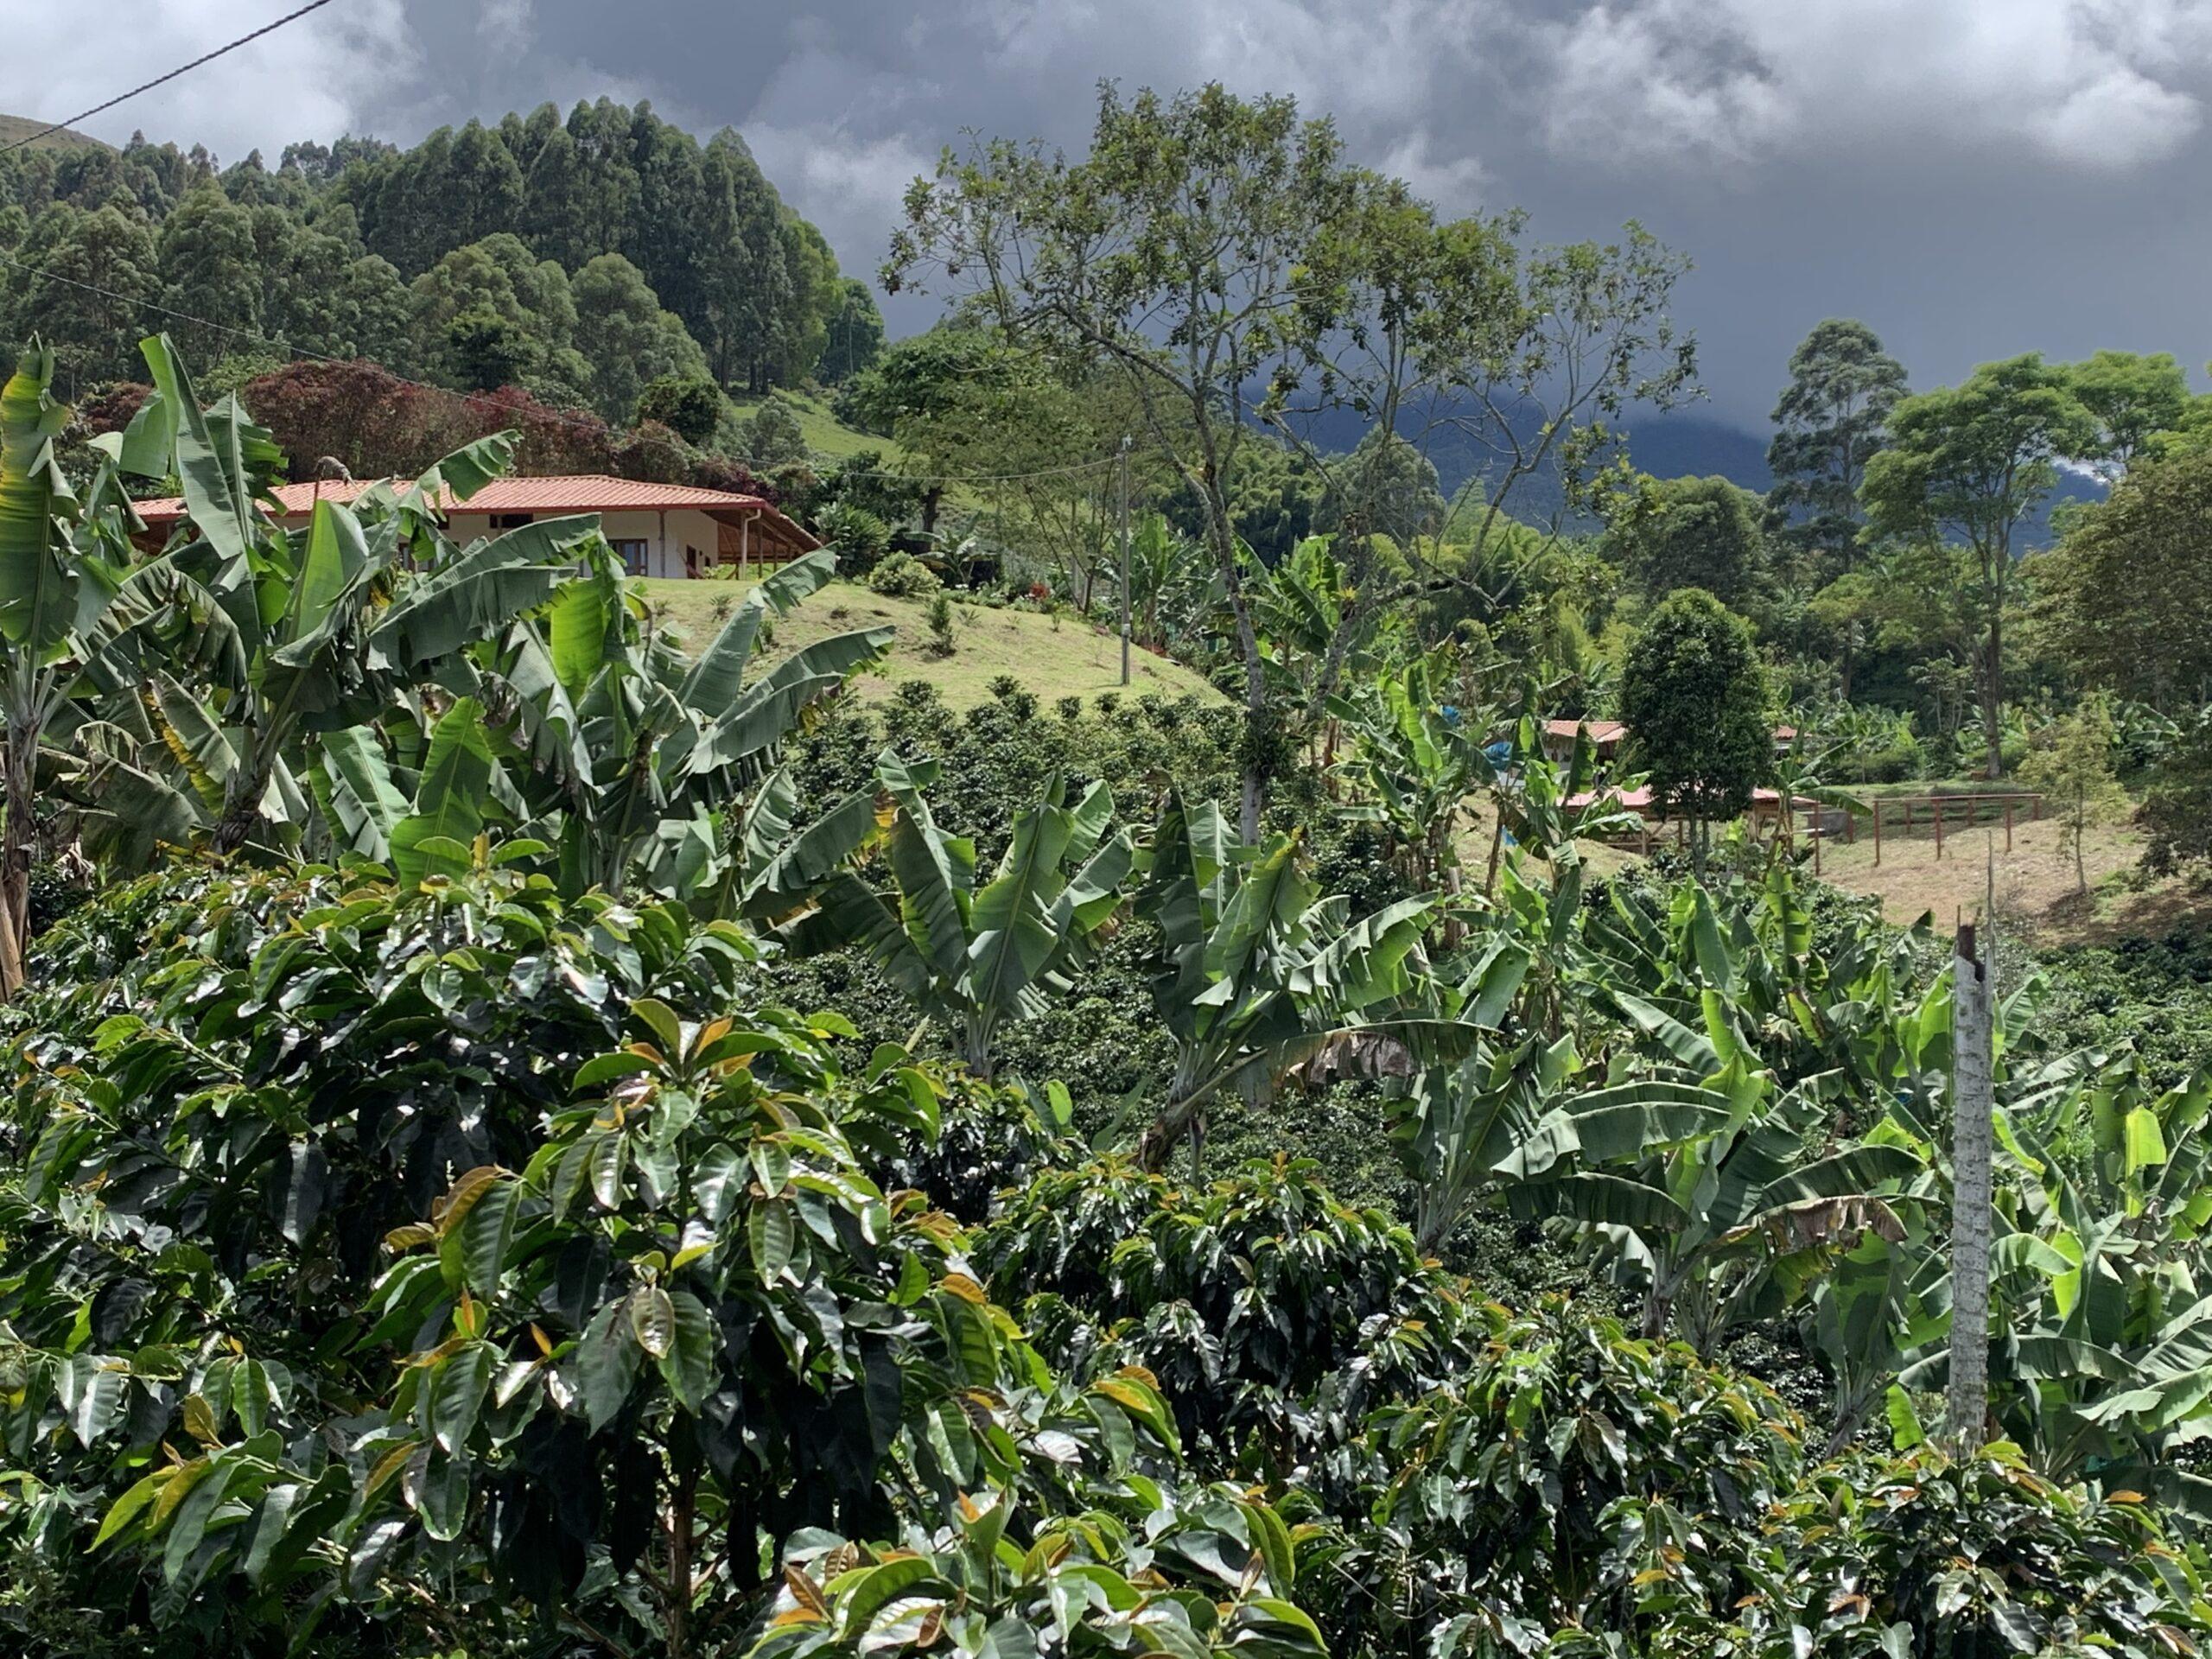 The coffee farm at Finca Mariposa